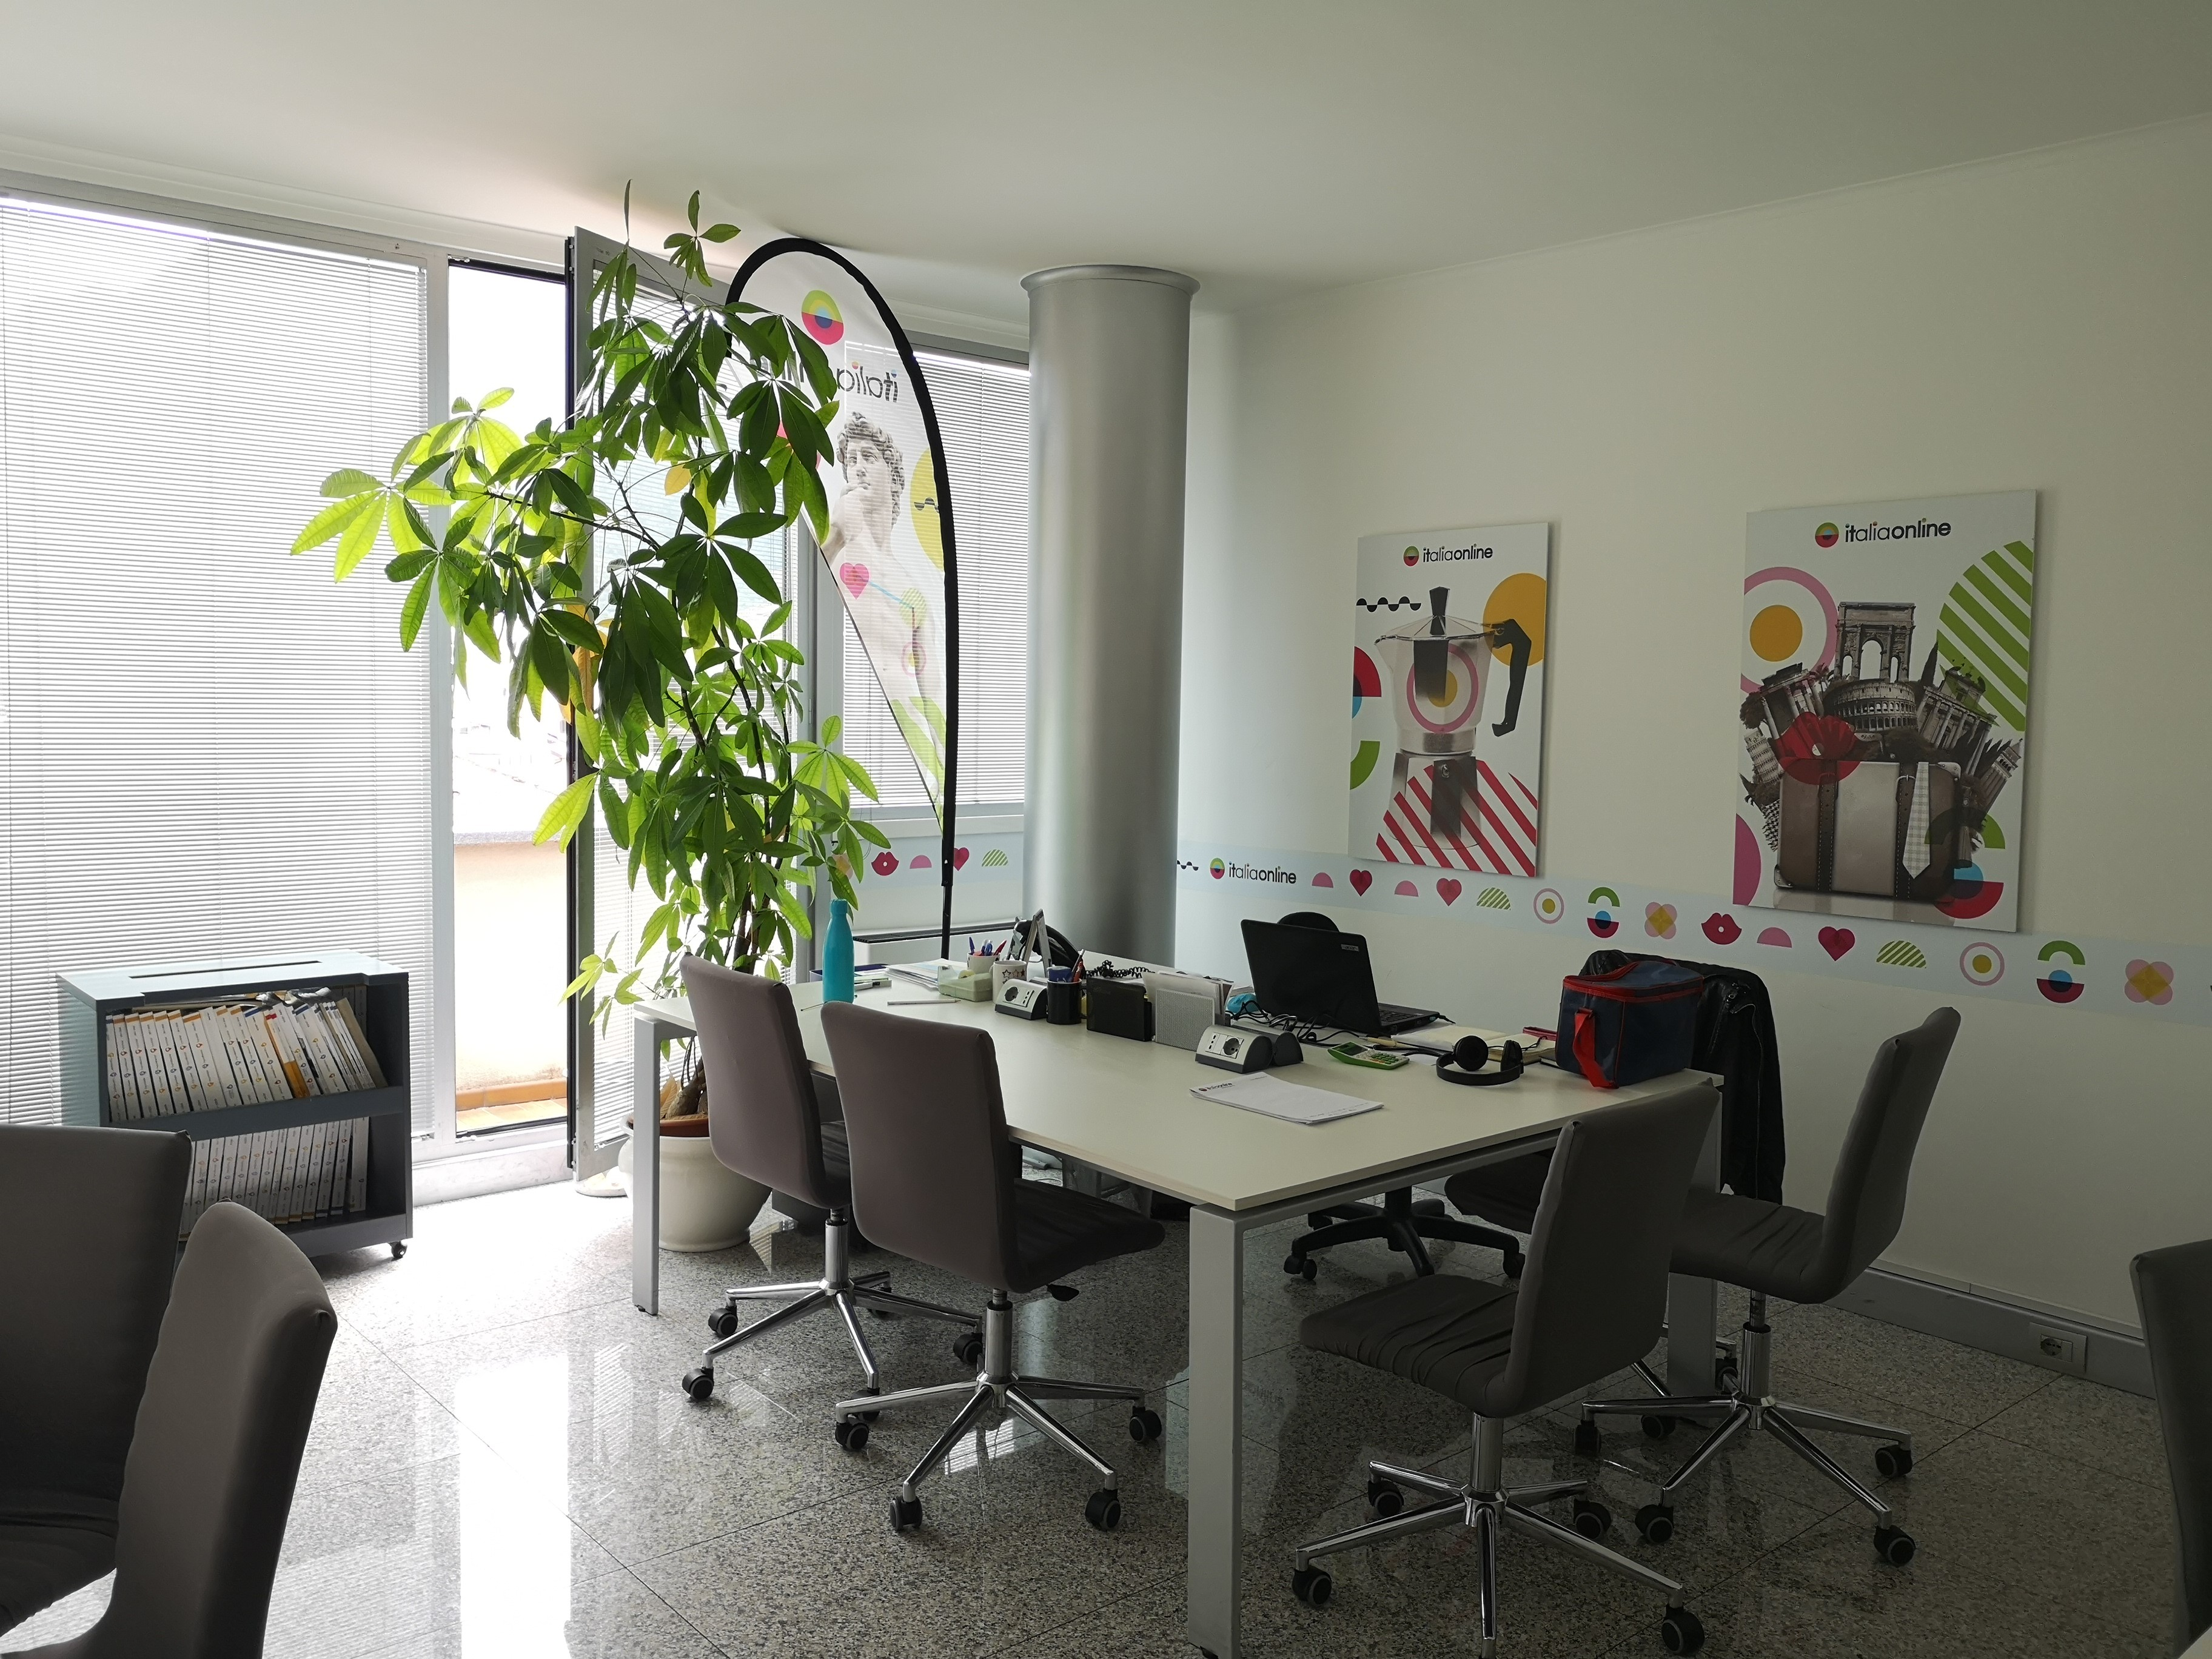 Web Agency Italiaonline Lecco